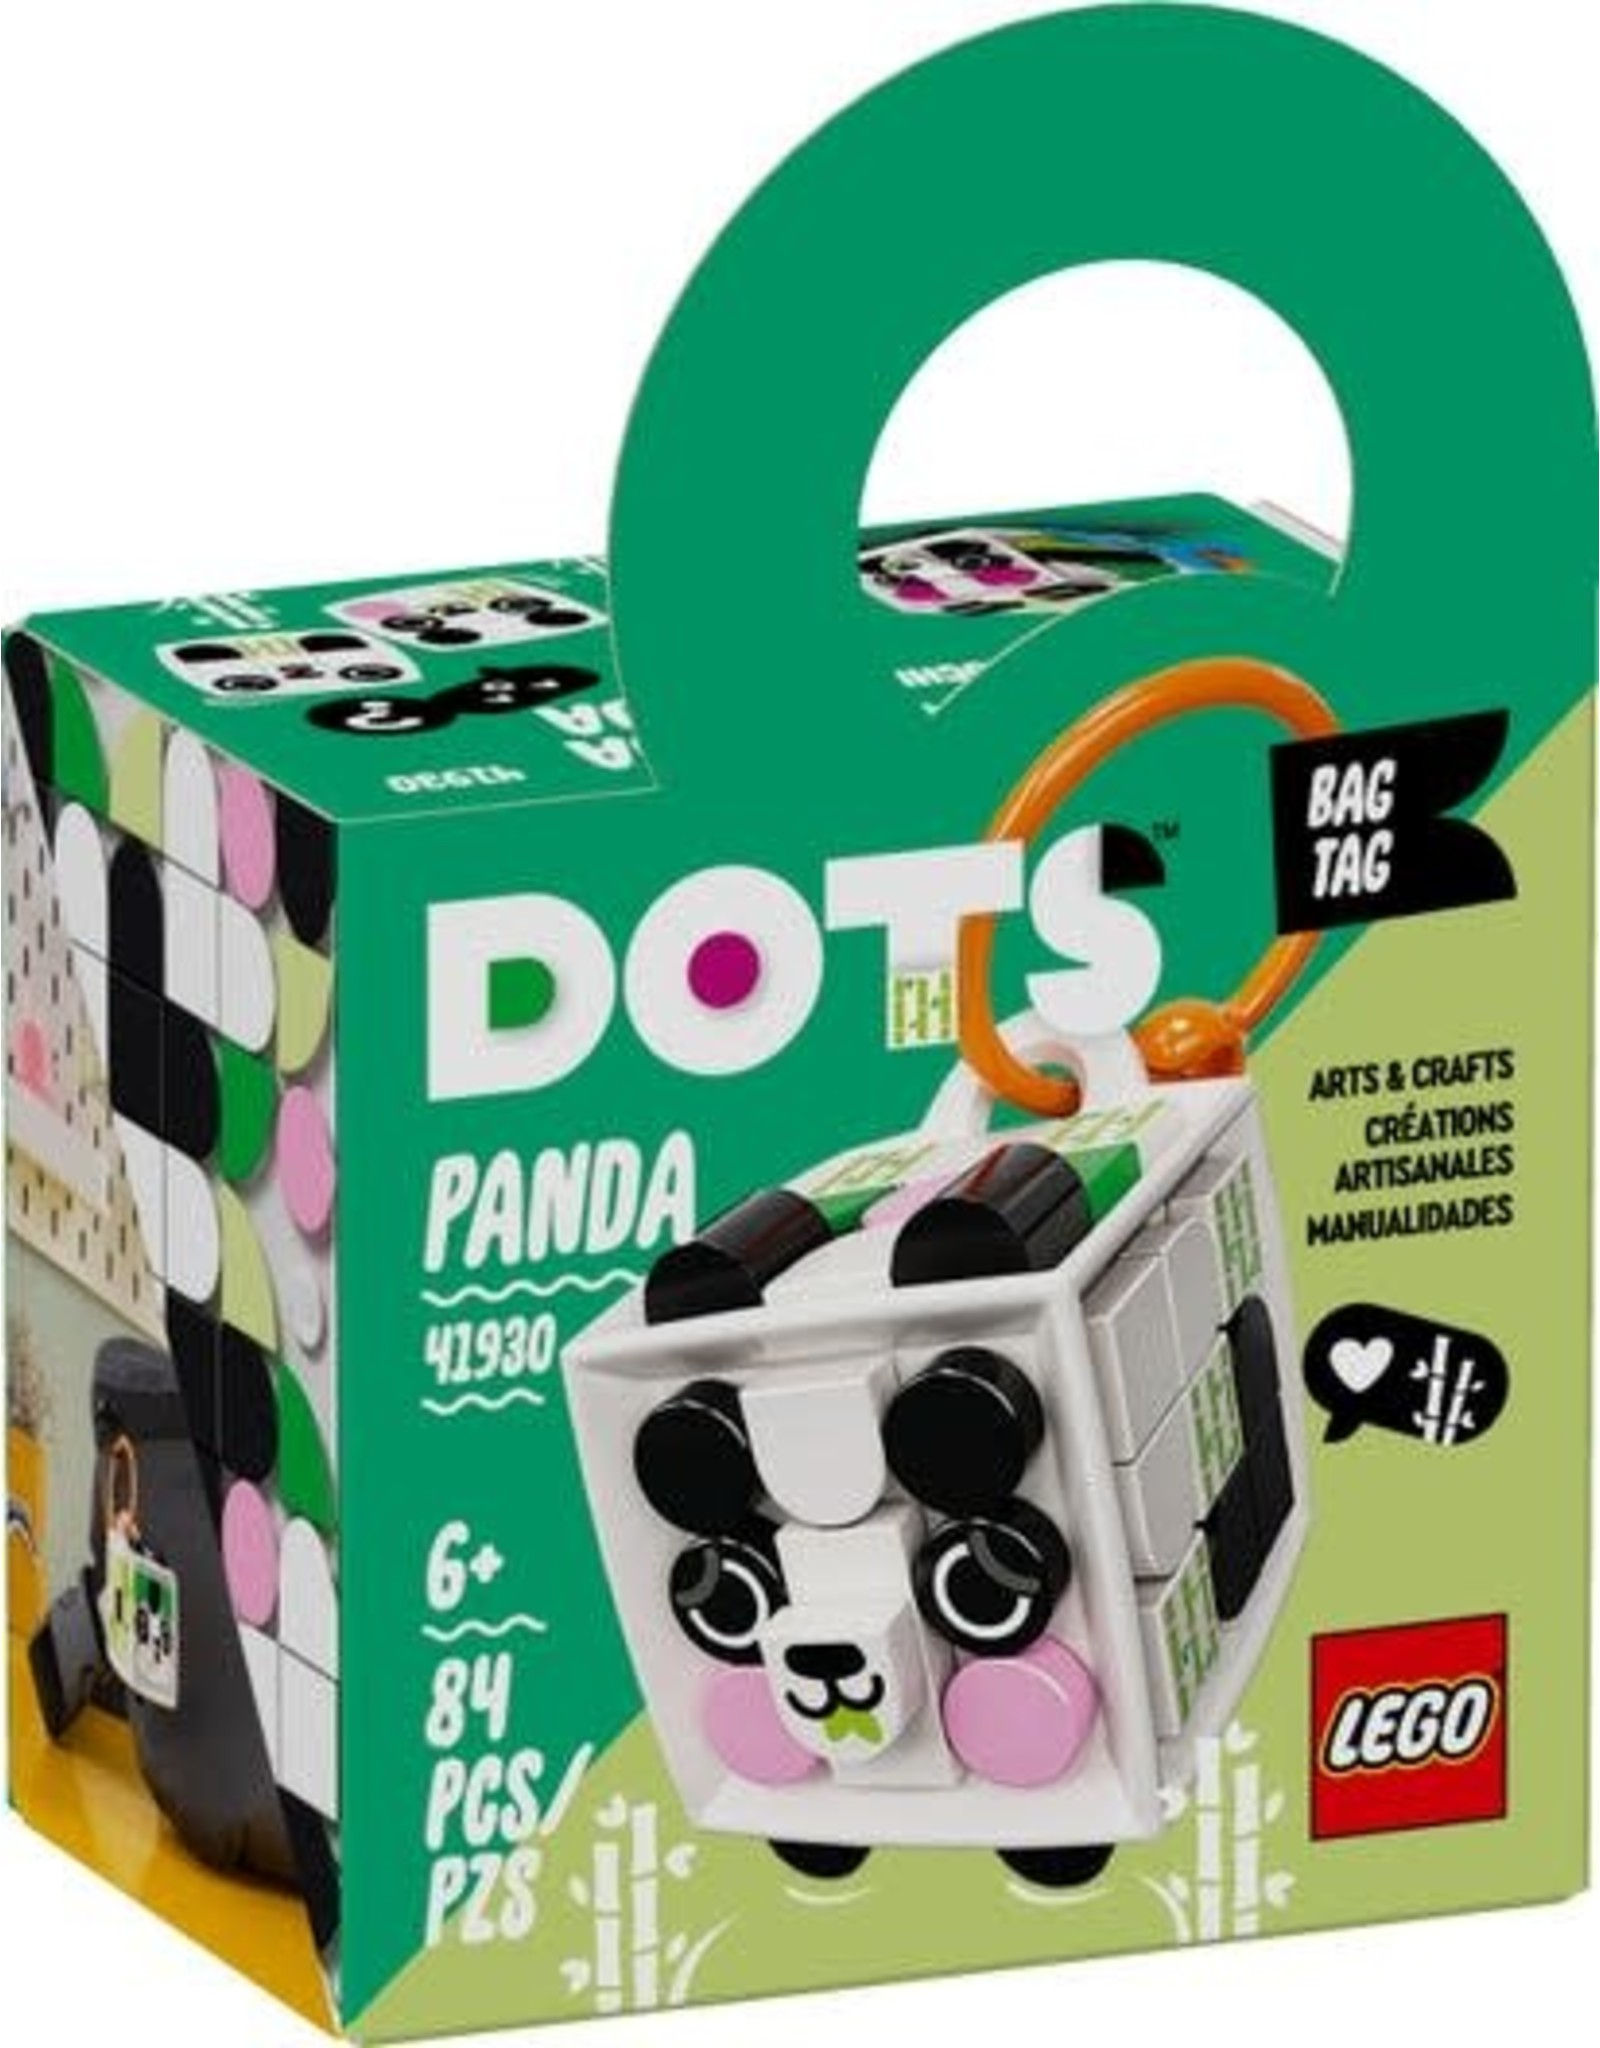 Lego LEGO DOTS: Bag Tag Panda